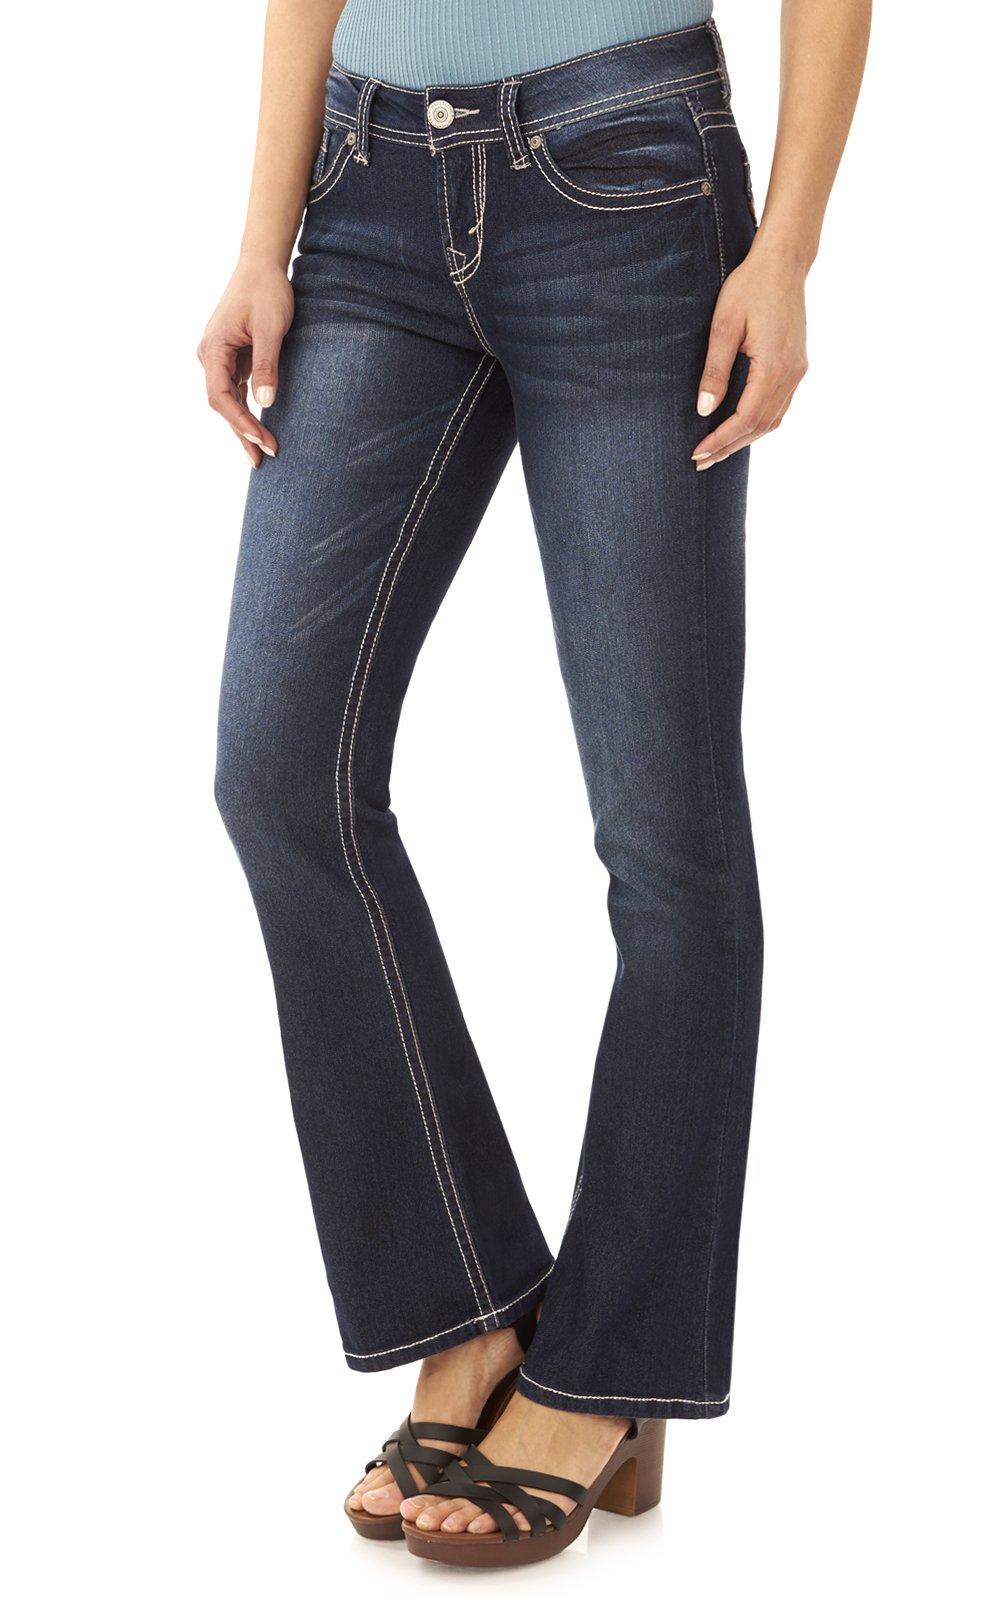 WallFlower Women's Juniors Basic Legendary Bootcut Jeans in Britney Size:17